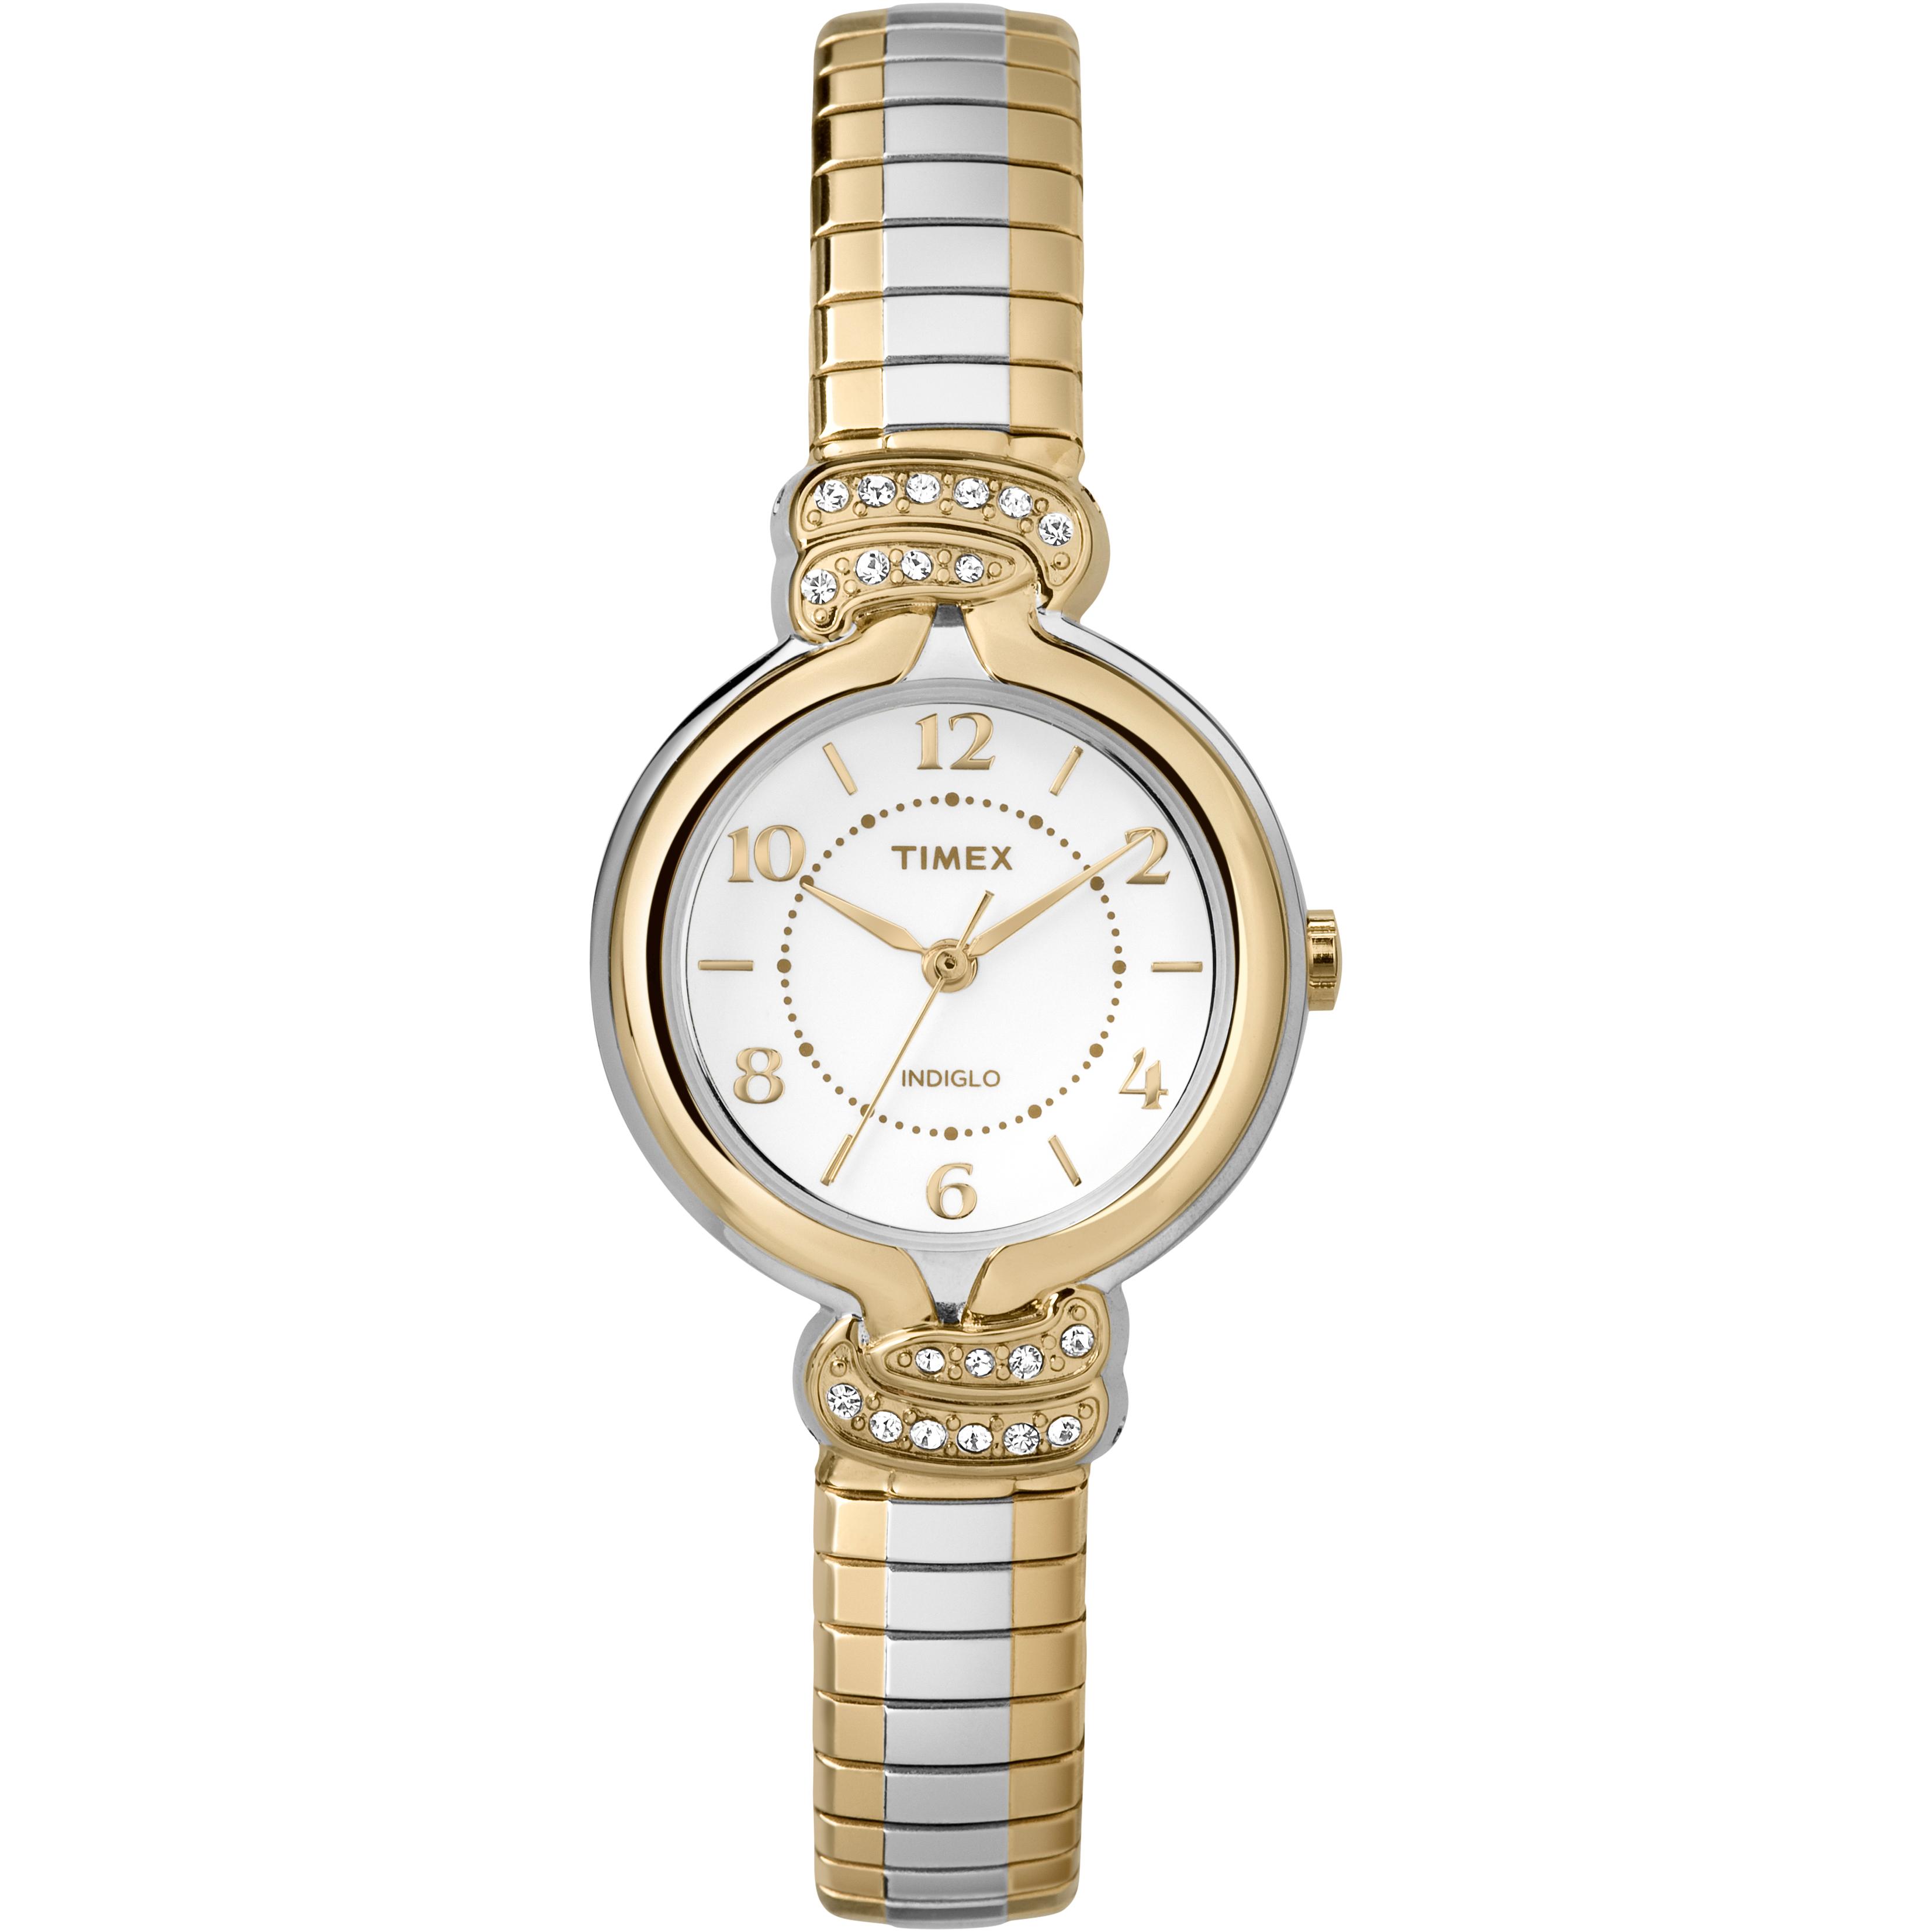 Timex women 39 s anna avenue silver tone dial swarovski crystals dress watch ebay for Swarovski crystals watch